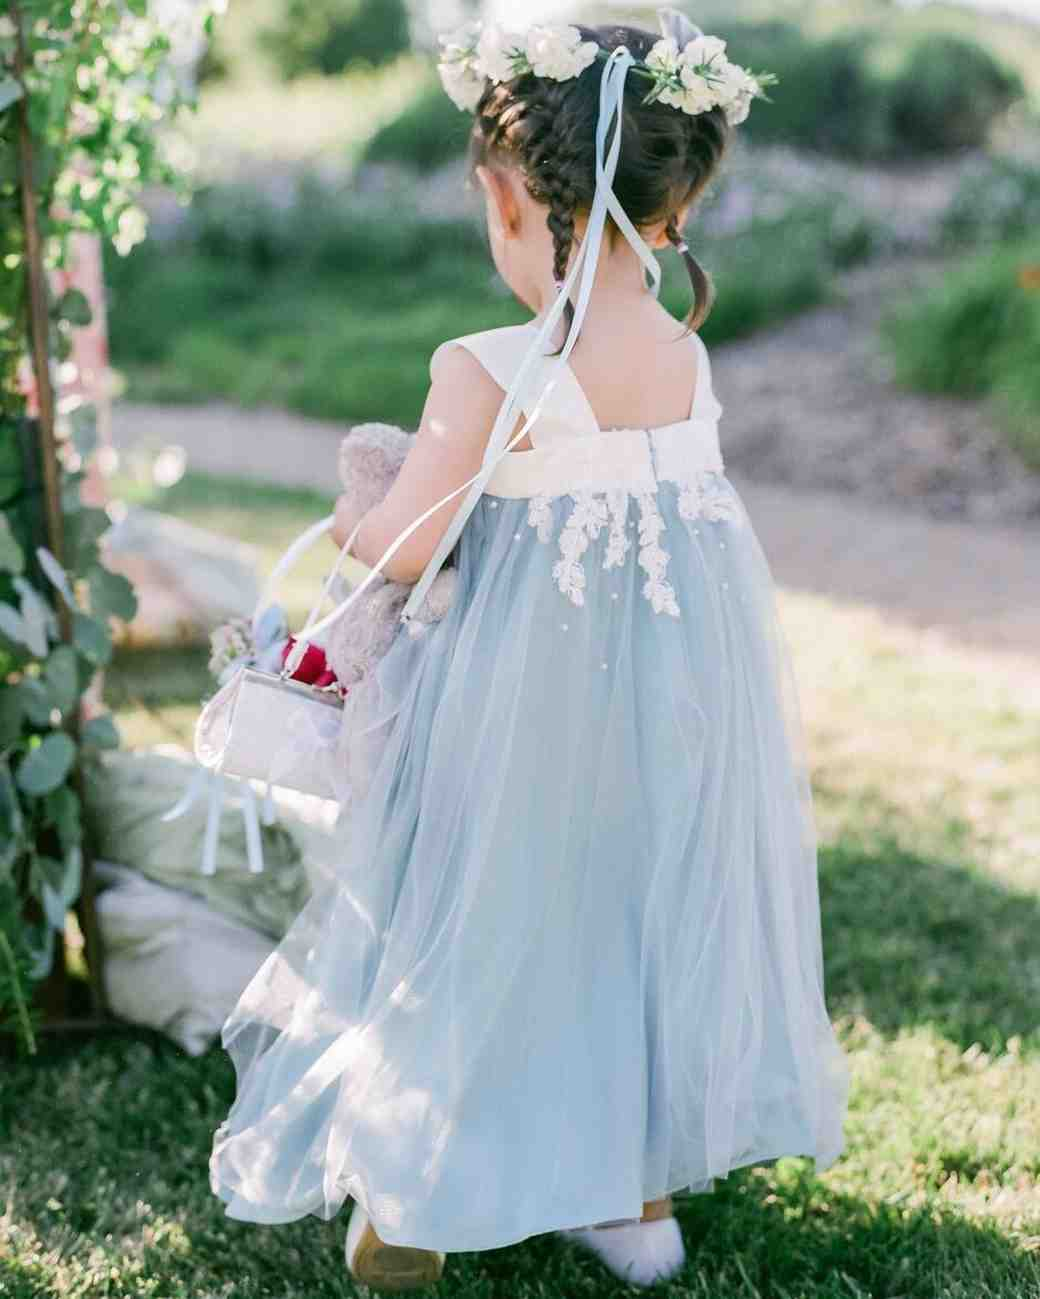 flower girl wearing blue and white dress